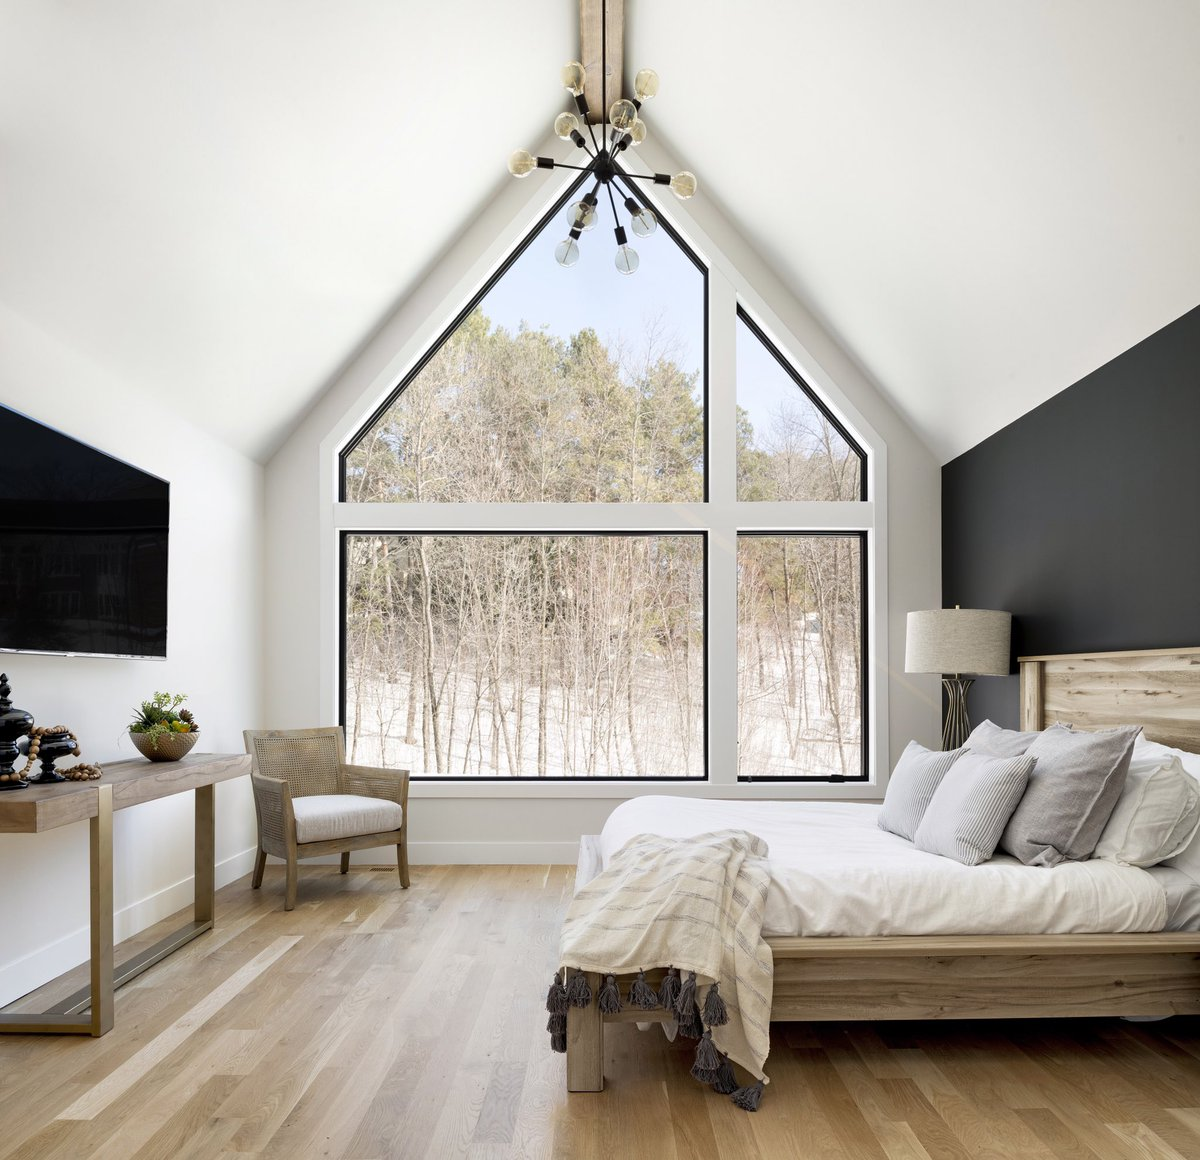 pix6 Scandinavian bedroom ideas that will inspire you to remodel